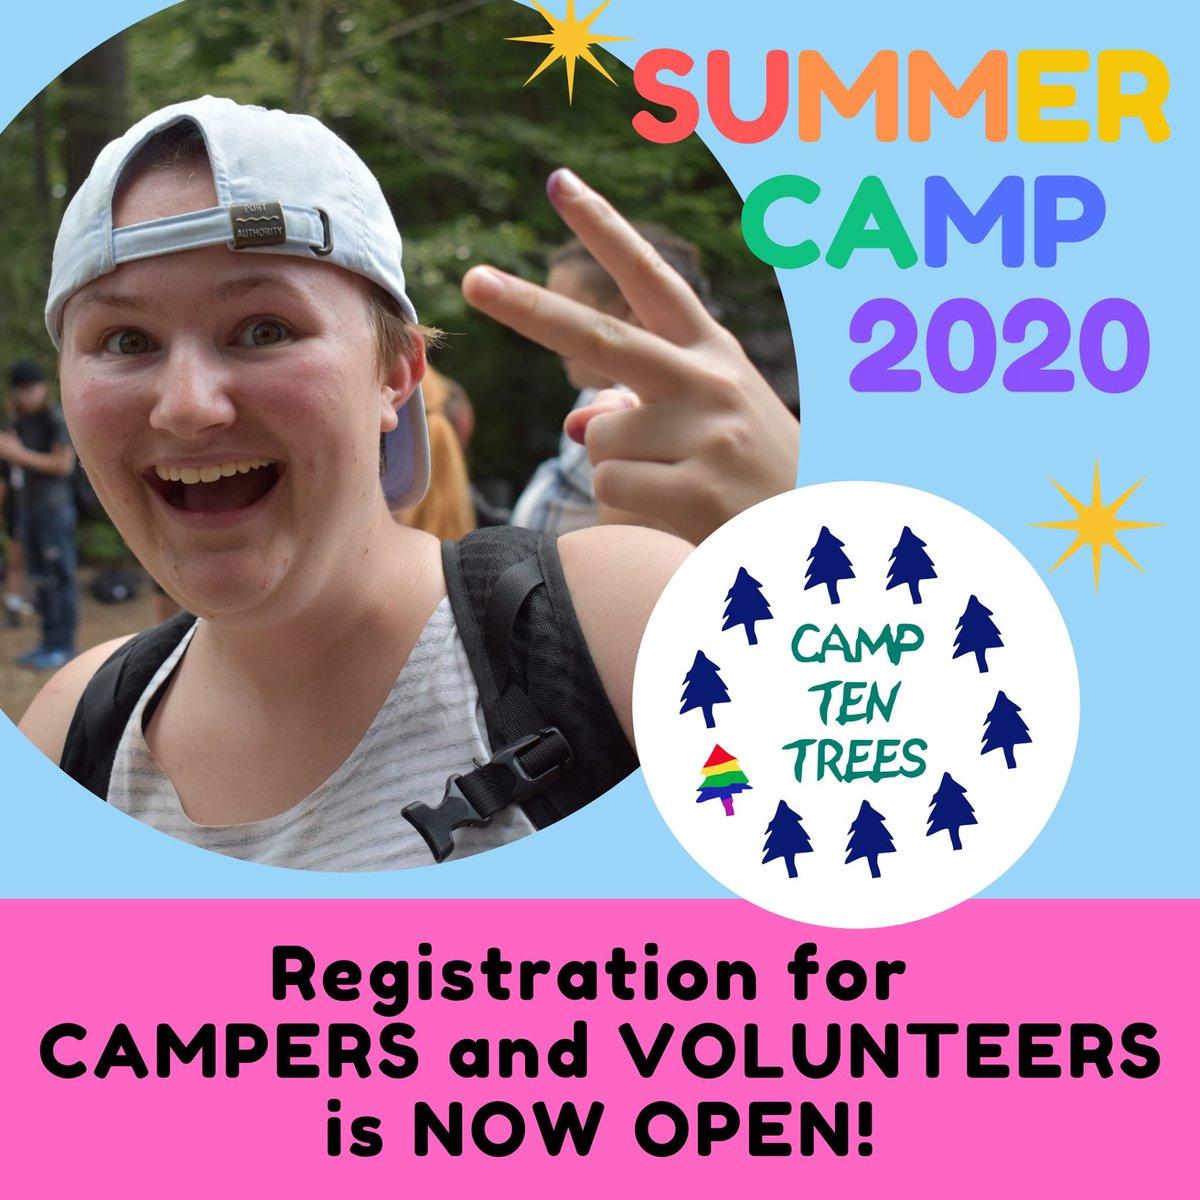 SUMMER CAMP registration is NOW OPEN!!! https://t.co/lbV1VtYK5i https://t.co/jZNgaLXYJ8